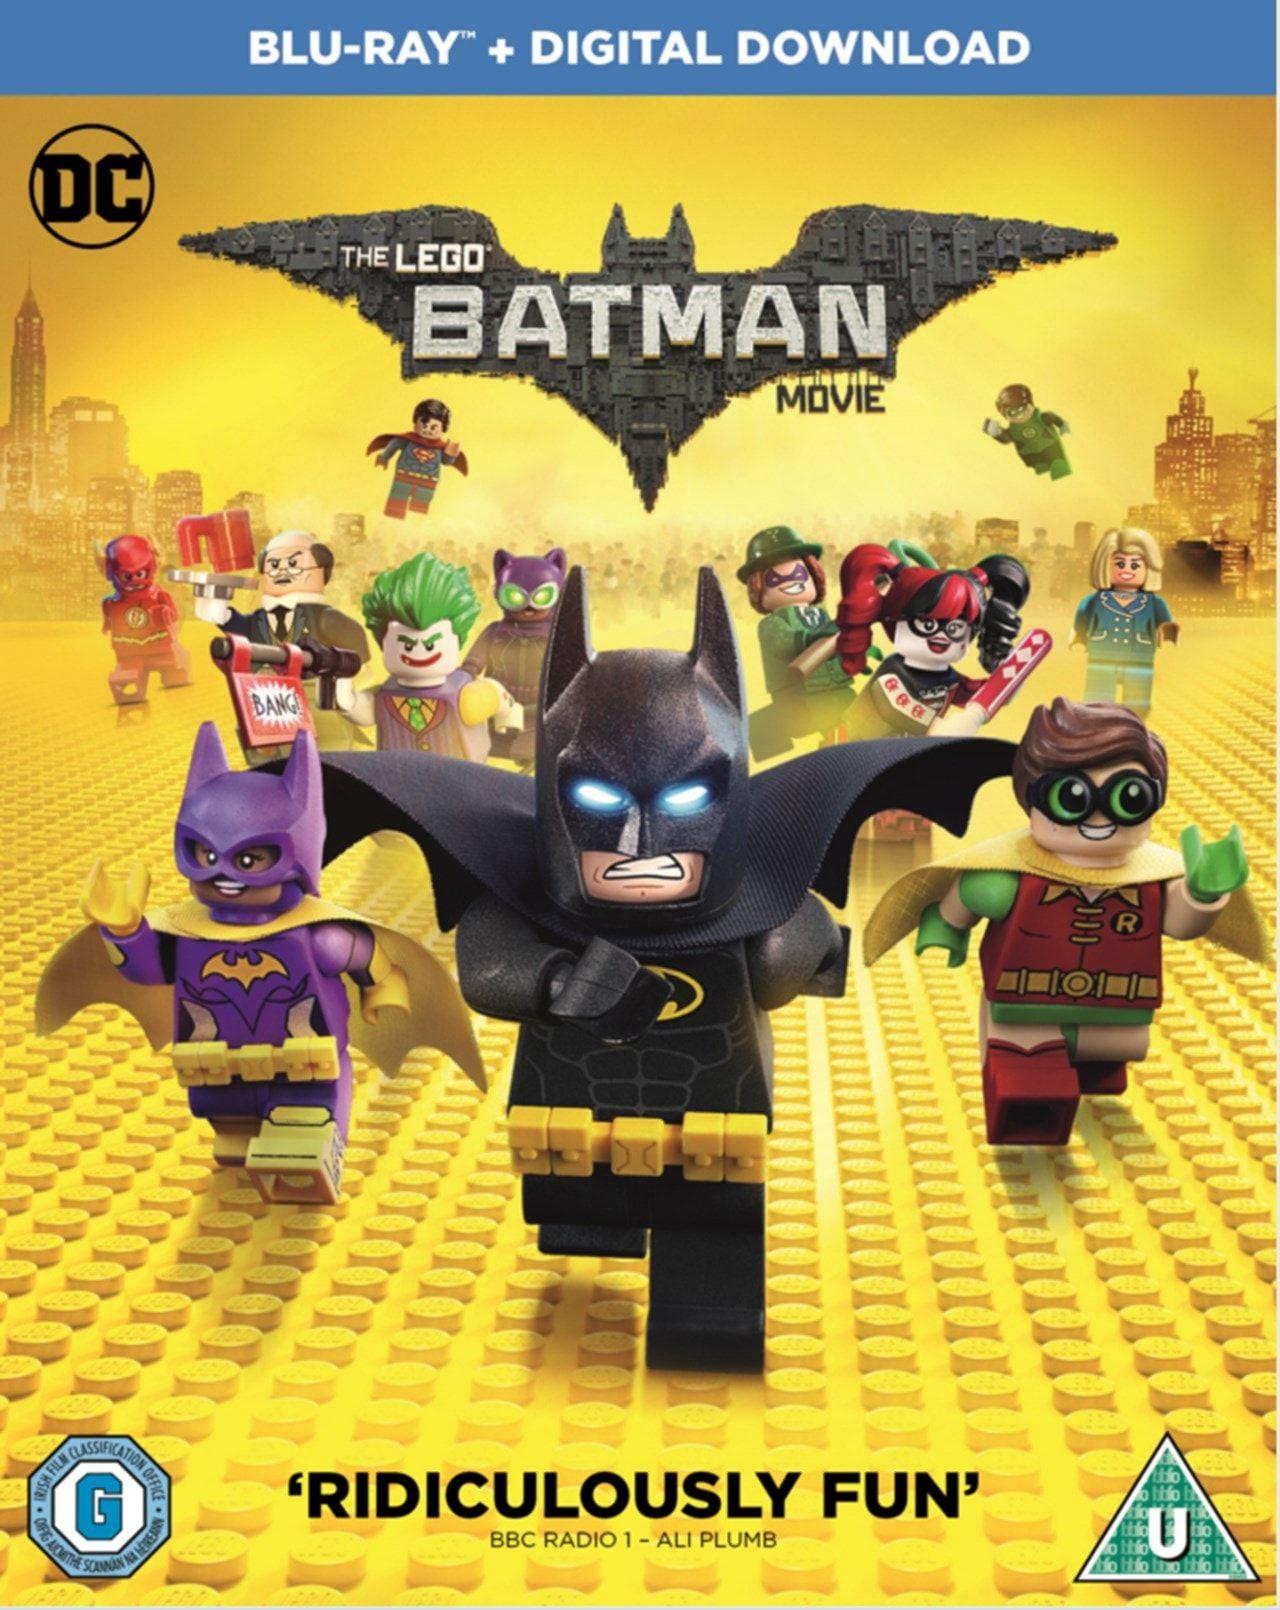 Lego Batman movie blu ray £2.75 @ youritdelivered/eBay